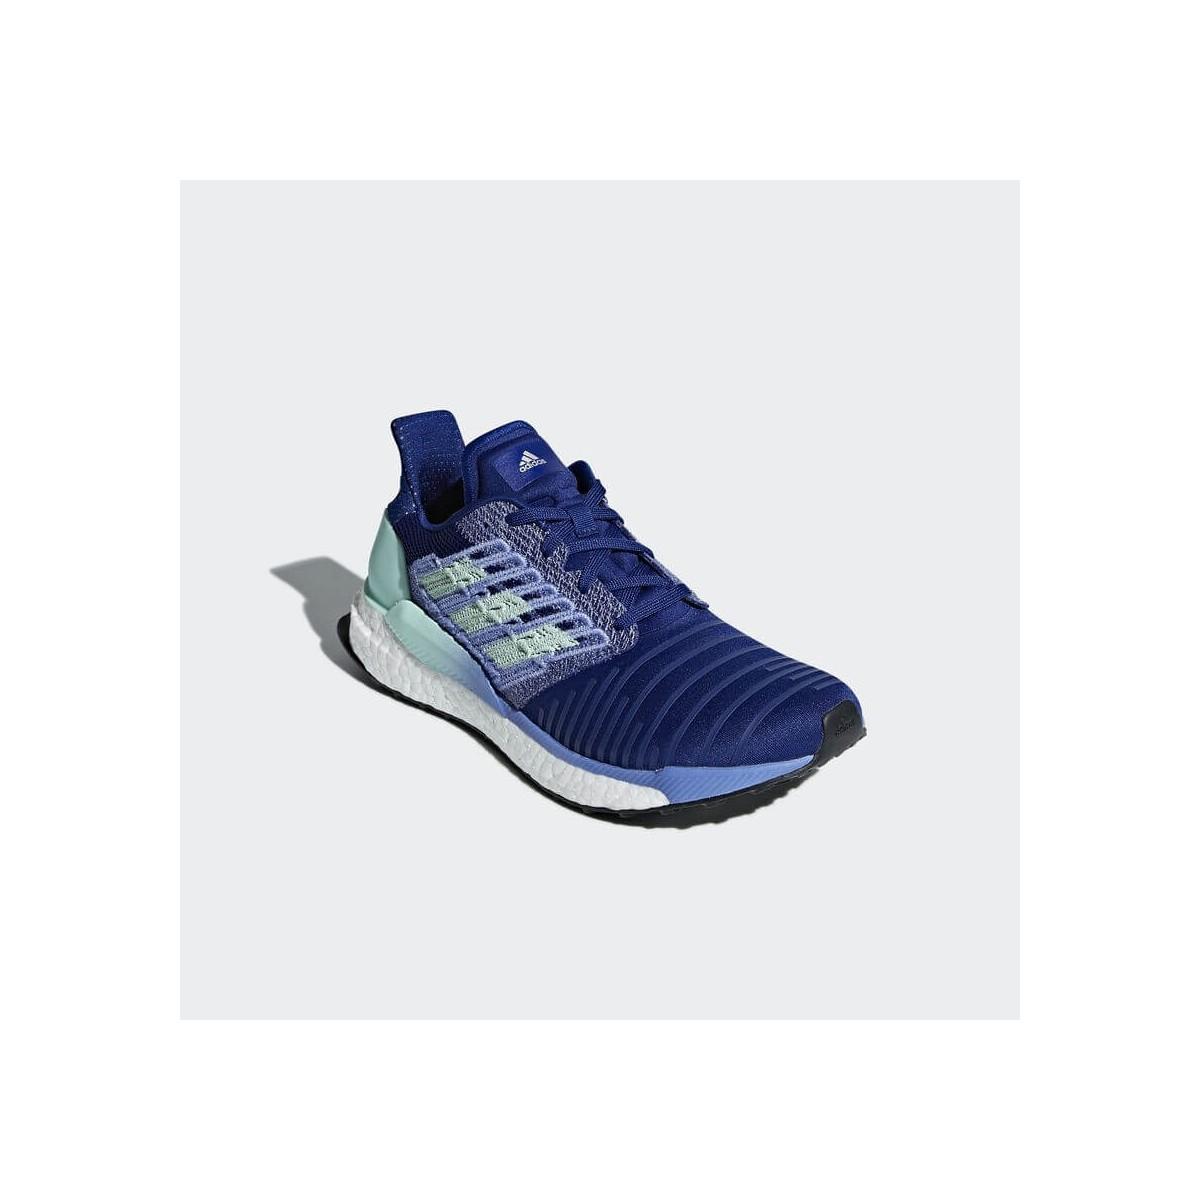 Boost Adidas Mujer 8c096 4a687 Solar Clearance 1KTJlFc